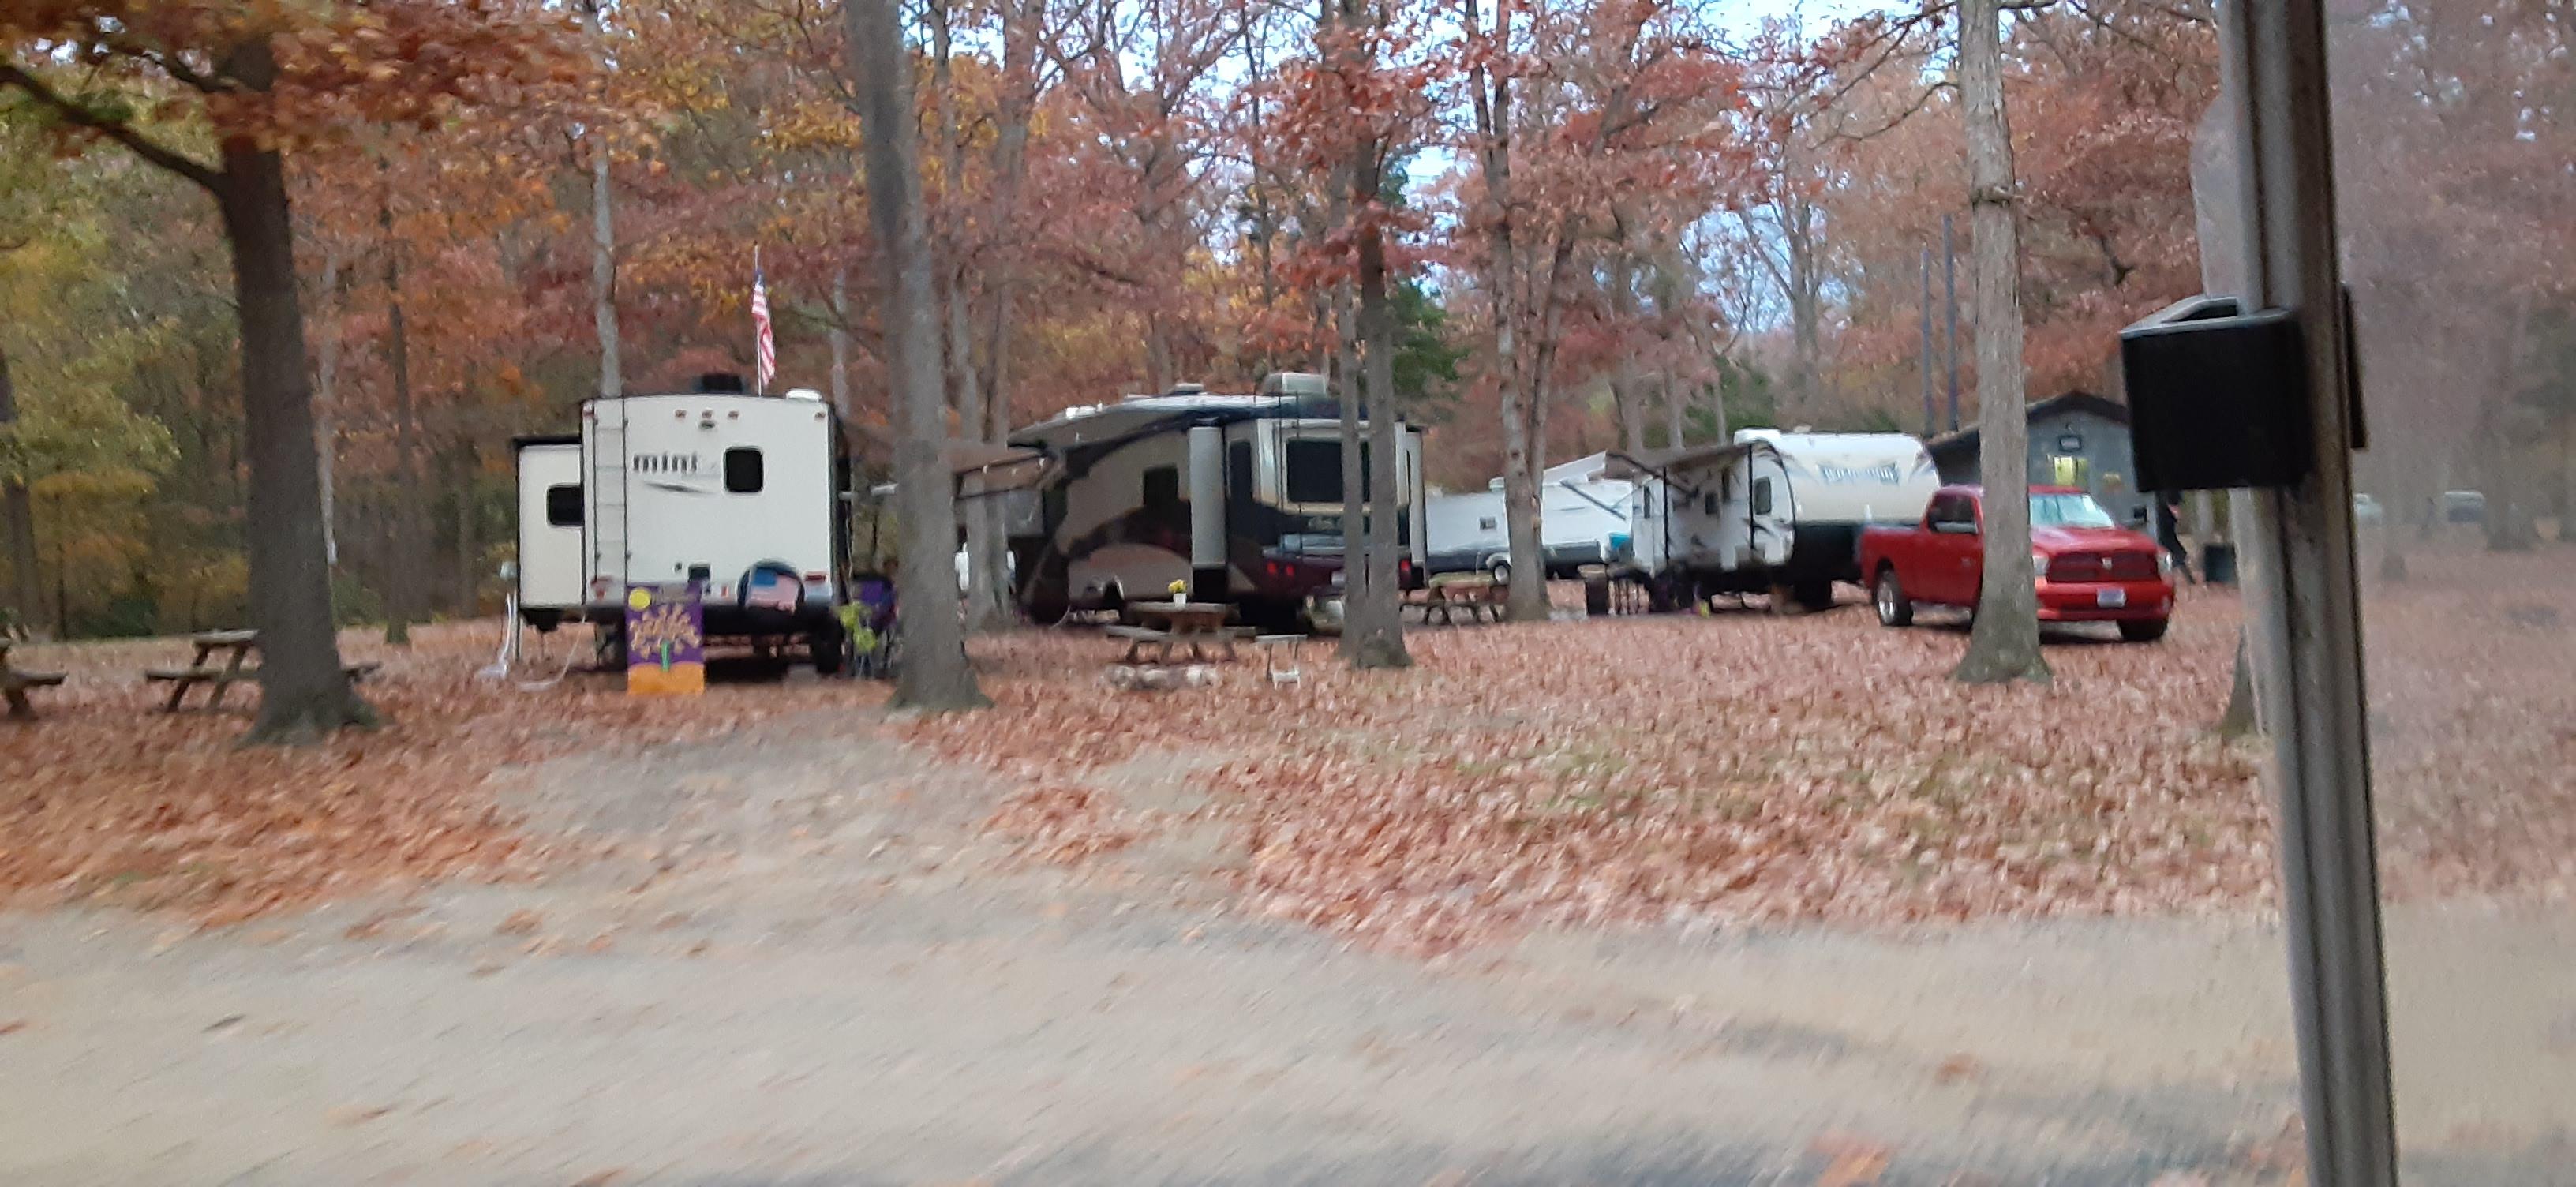 Camping at Fort Valley Ranch